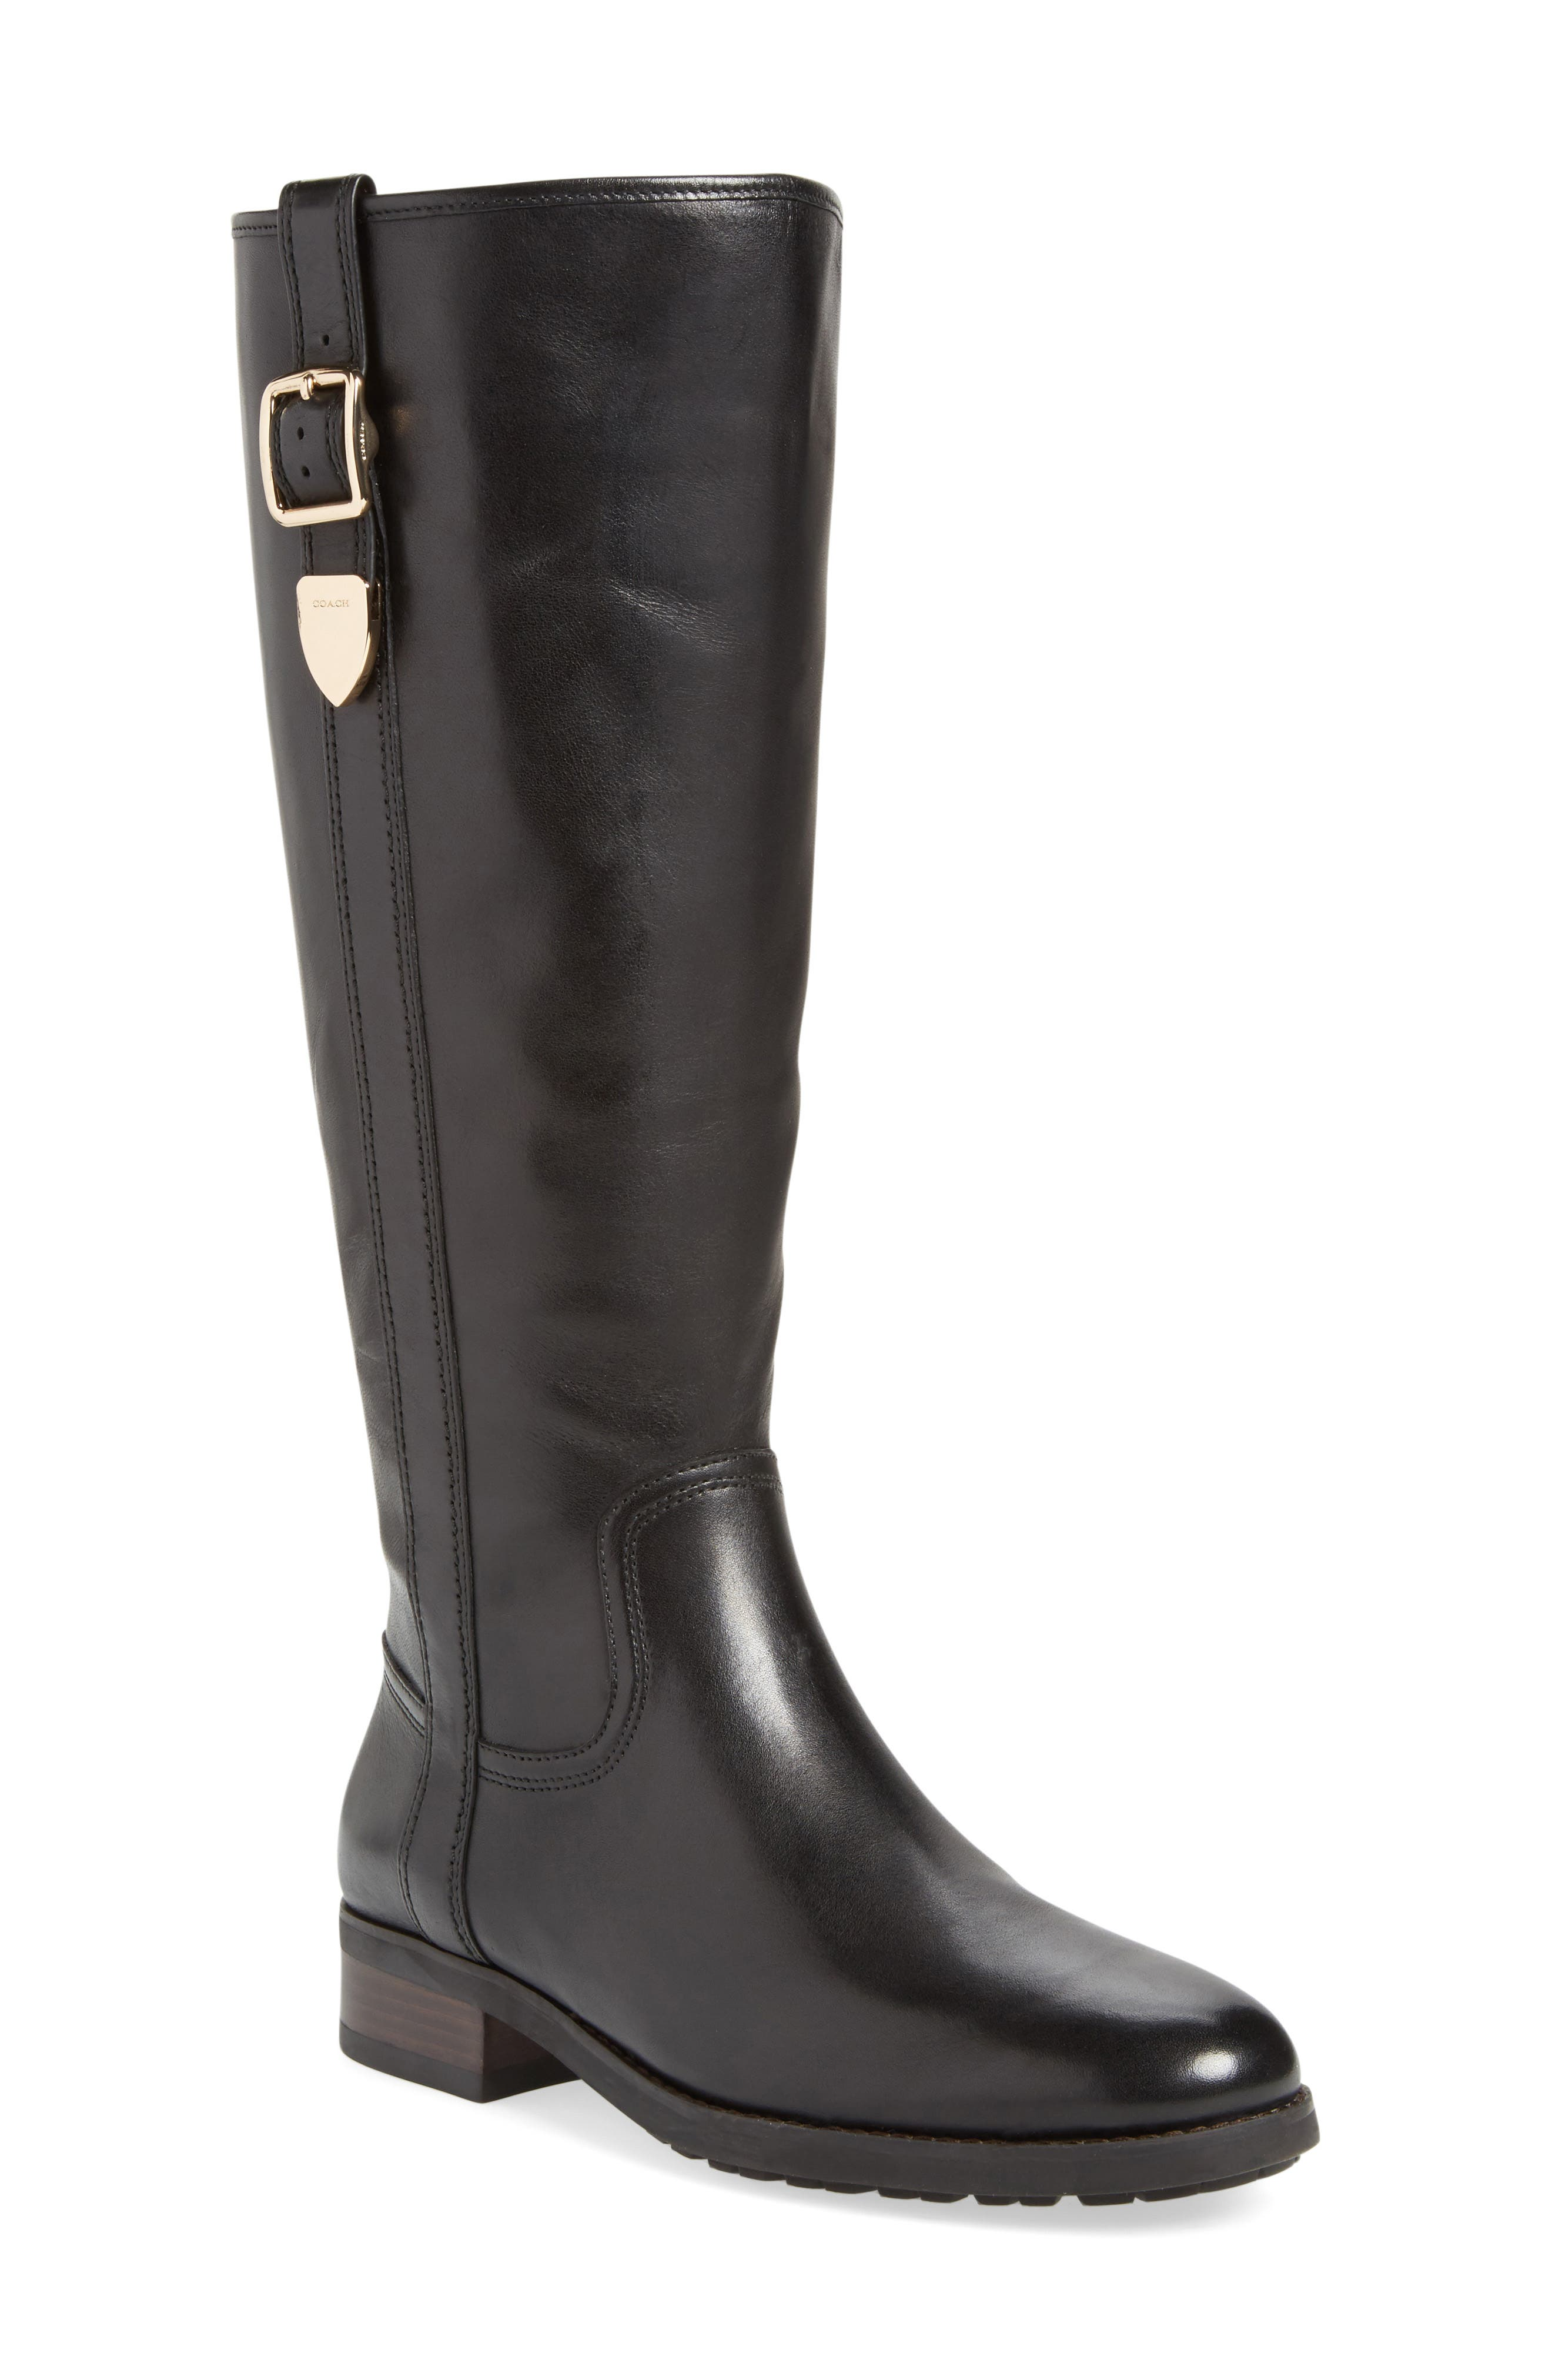 Main Image - COACH 'Easton' Tall Boot (Women)